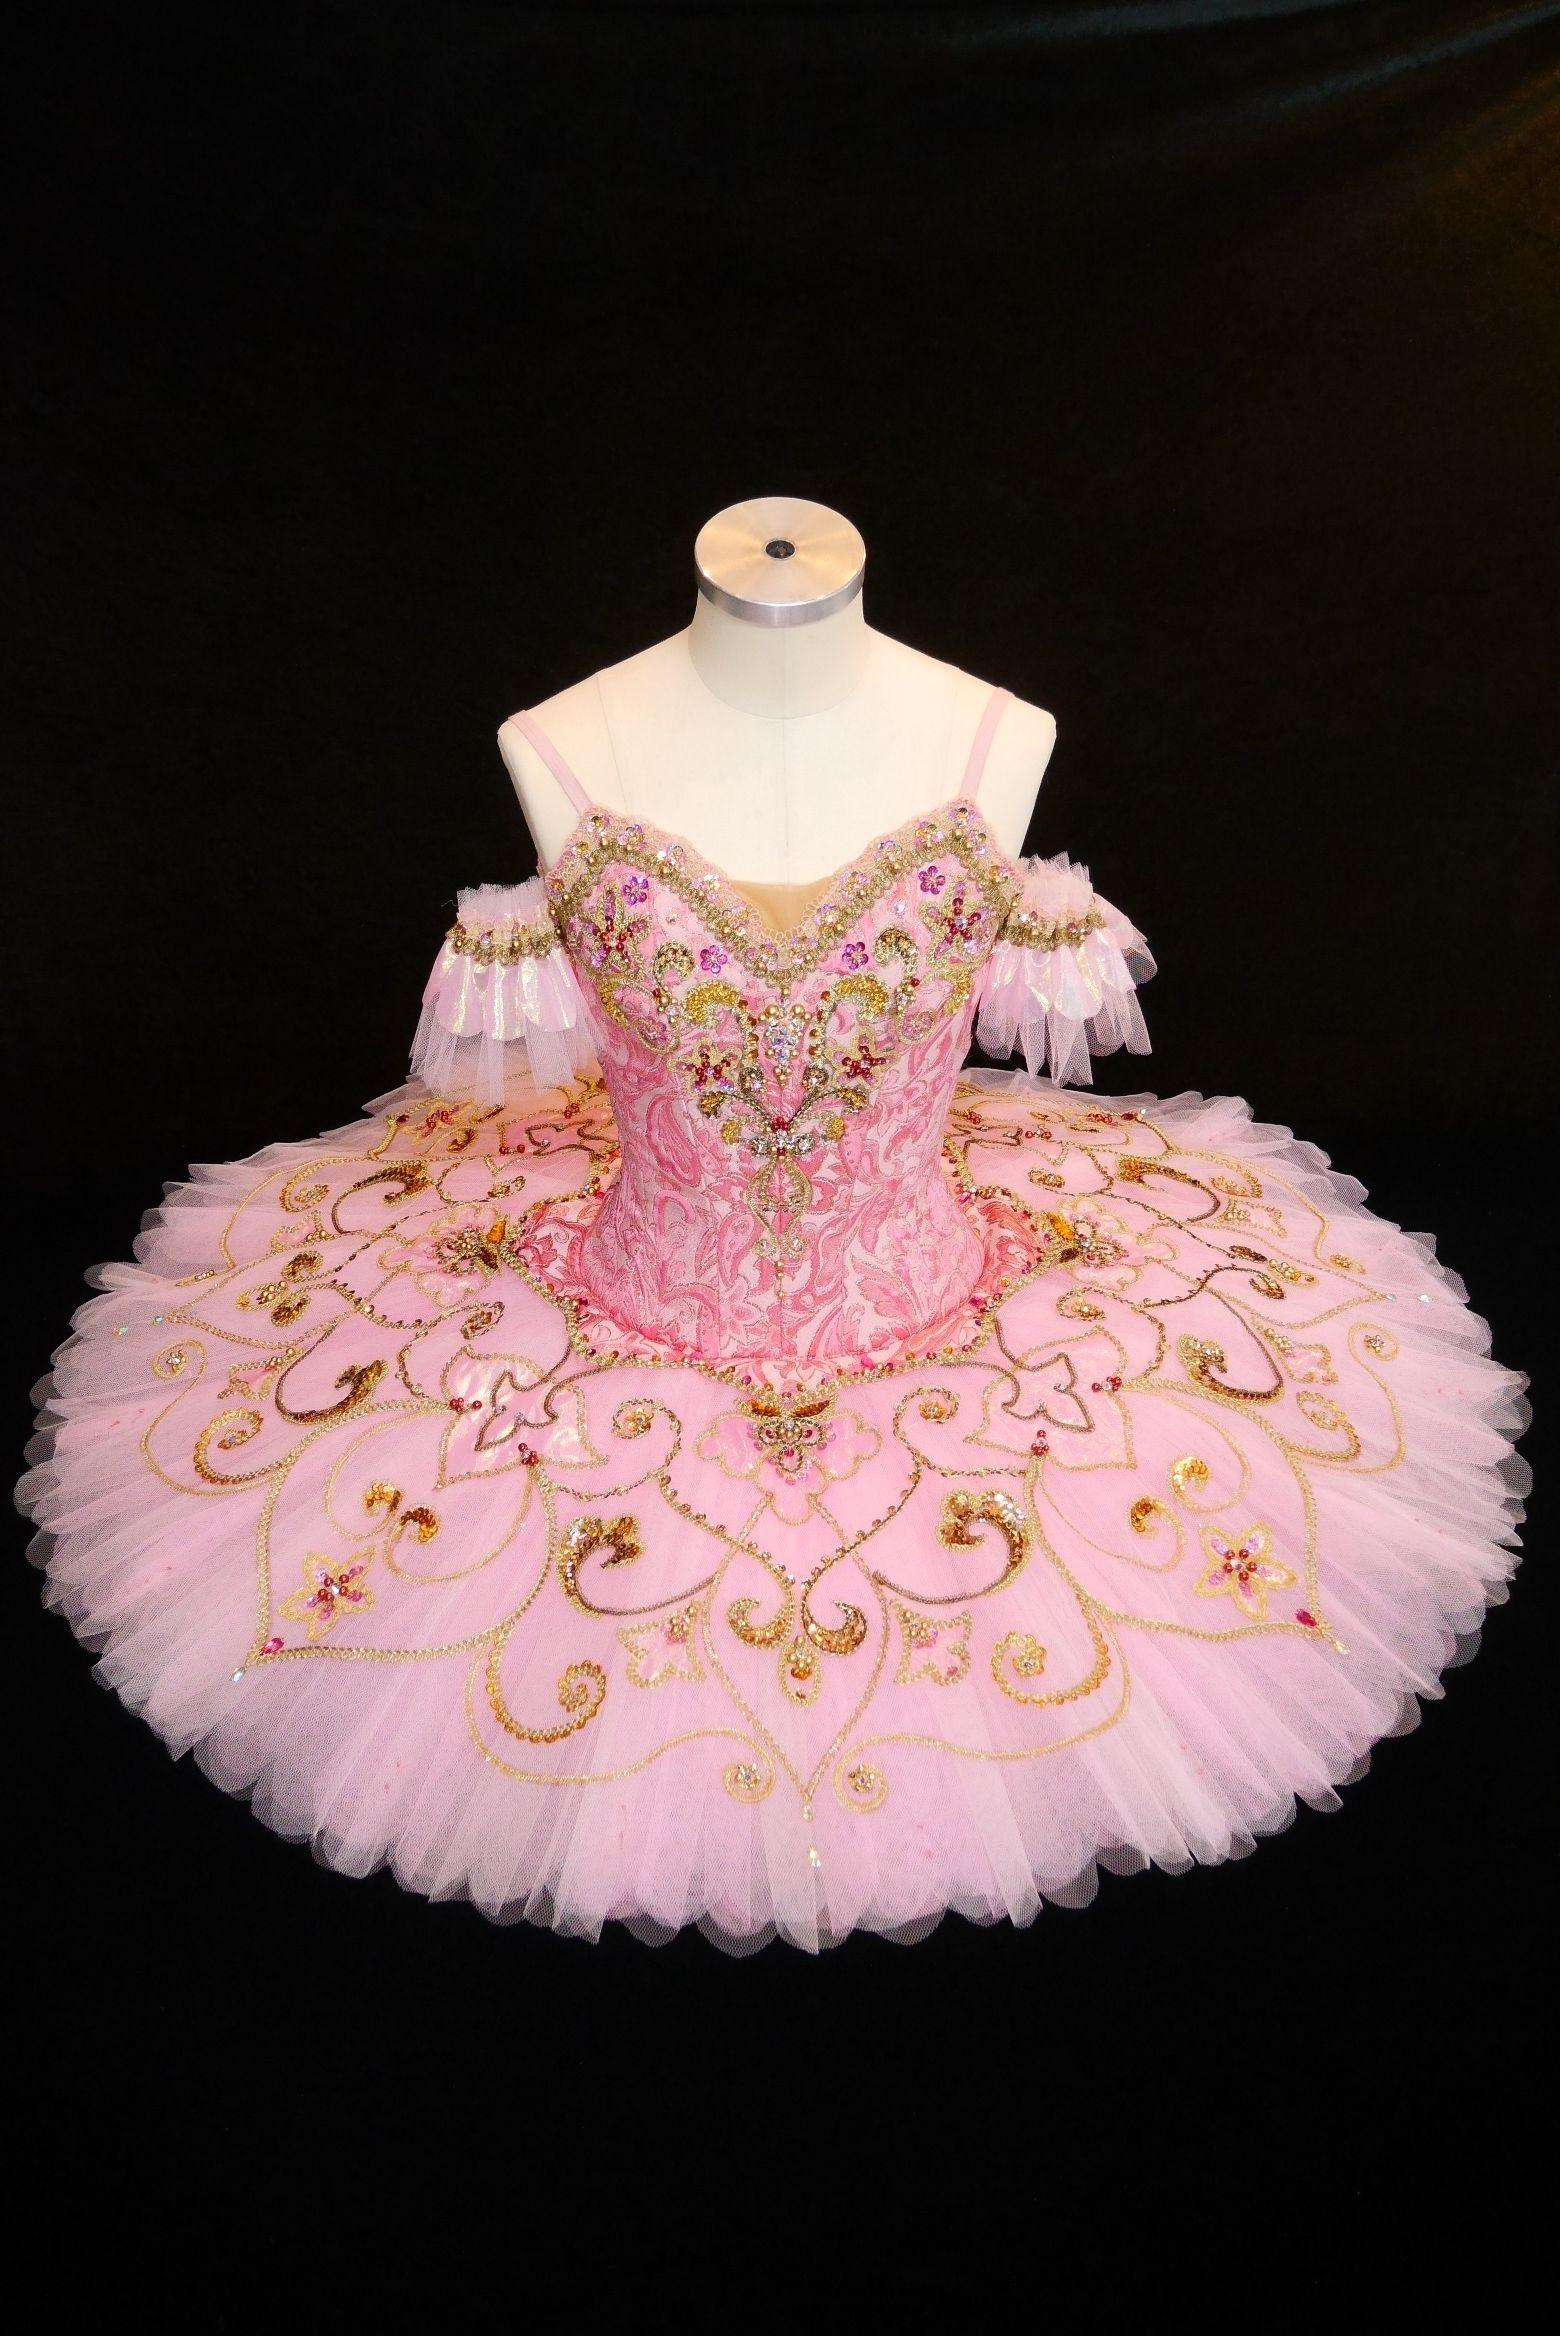 The Nutcracker- Sugarplum fairy tutu (Act 3) | Ballet | Pinterest ...